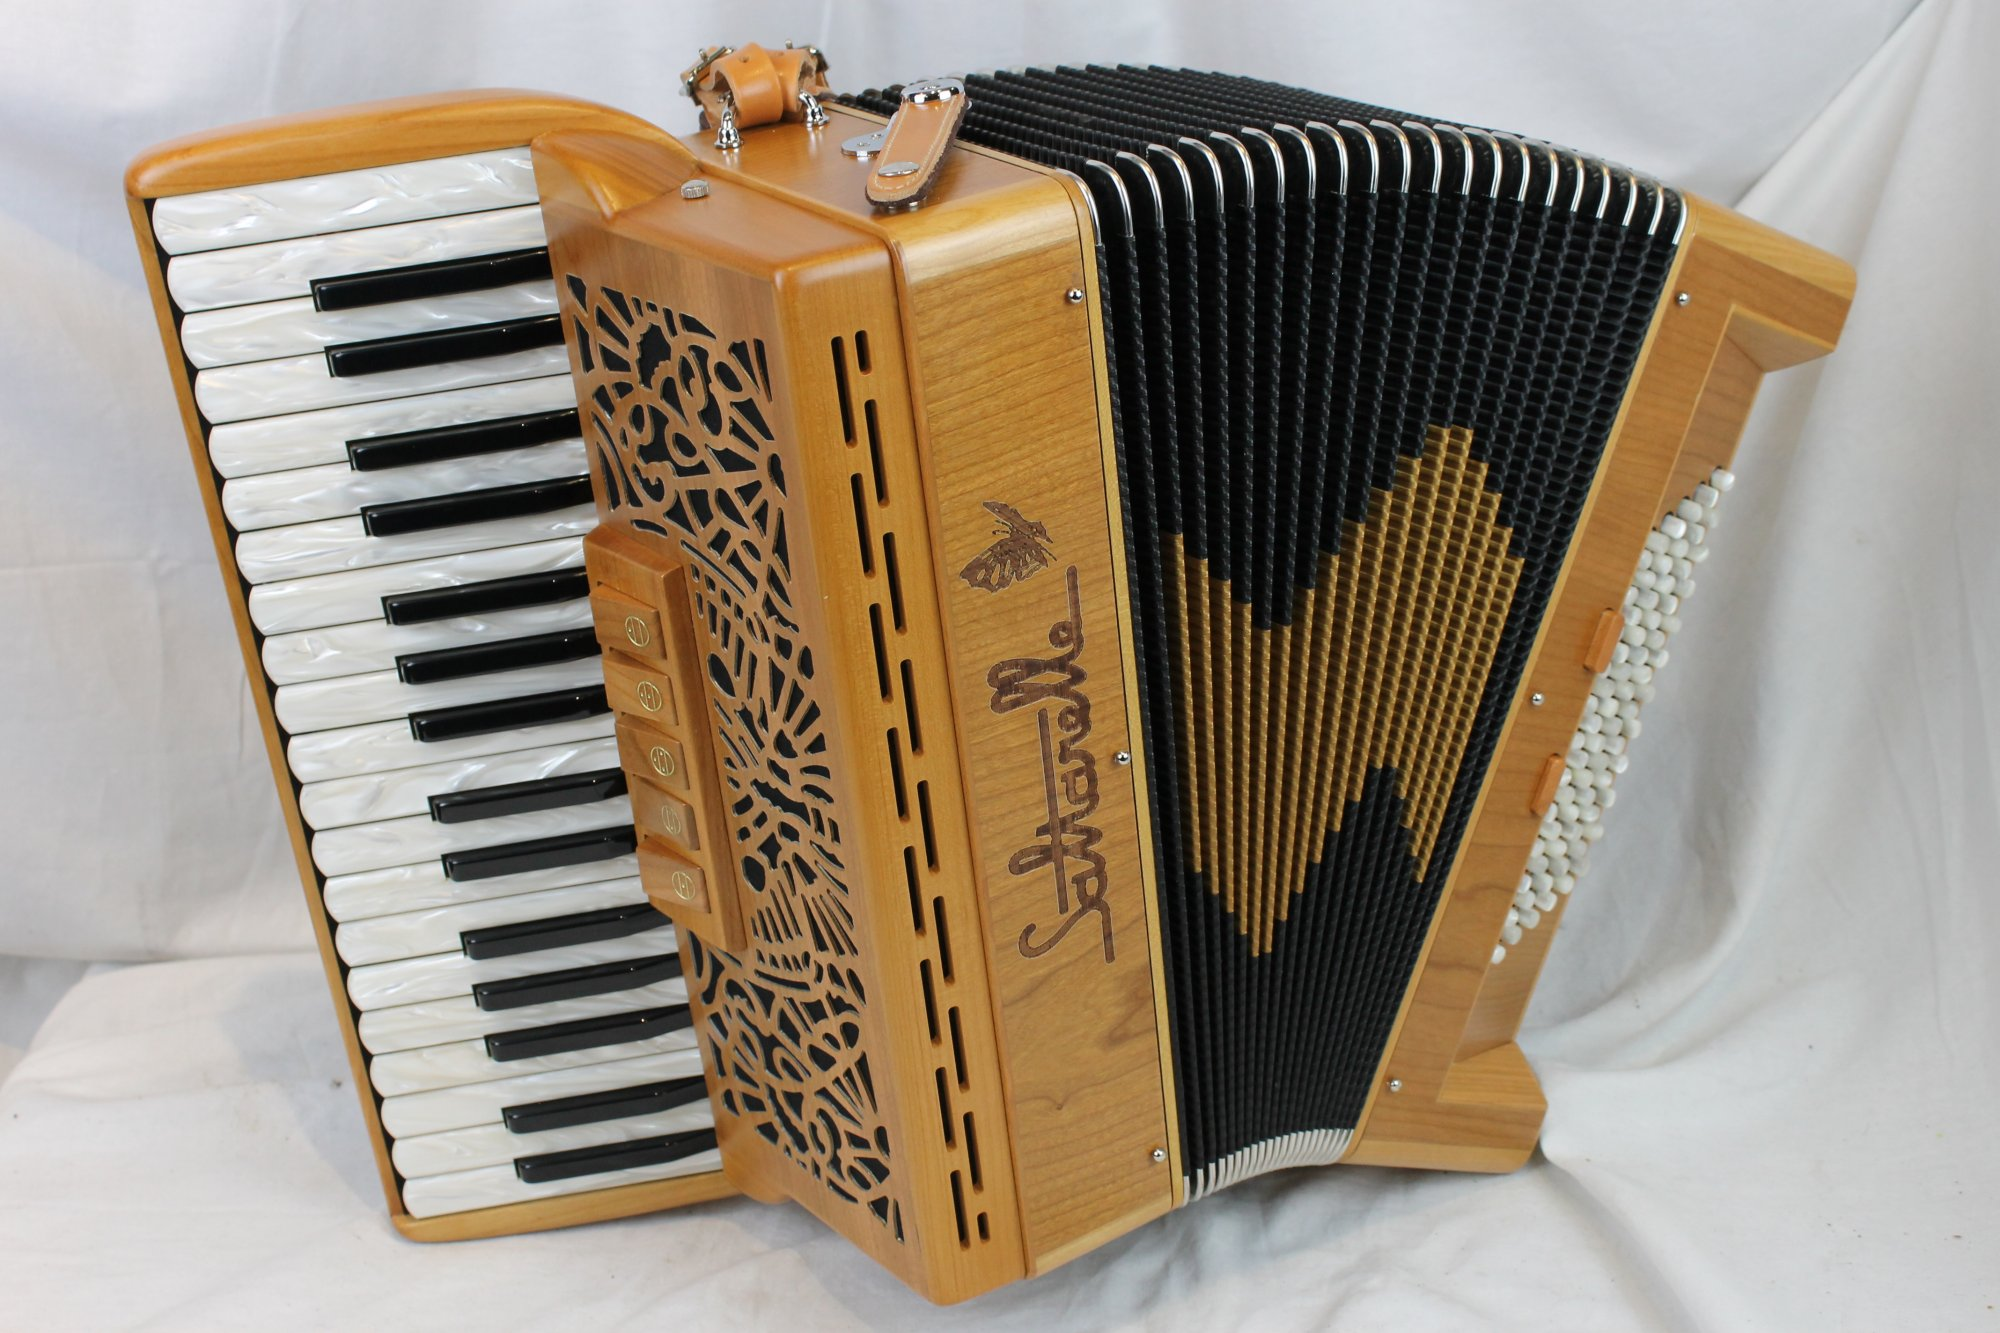 NEW Cherry Saltarelle Cleggan Piano Accordion LMM 35 72